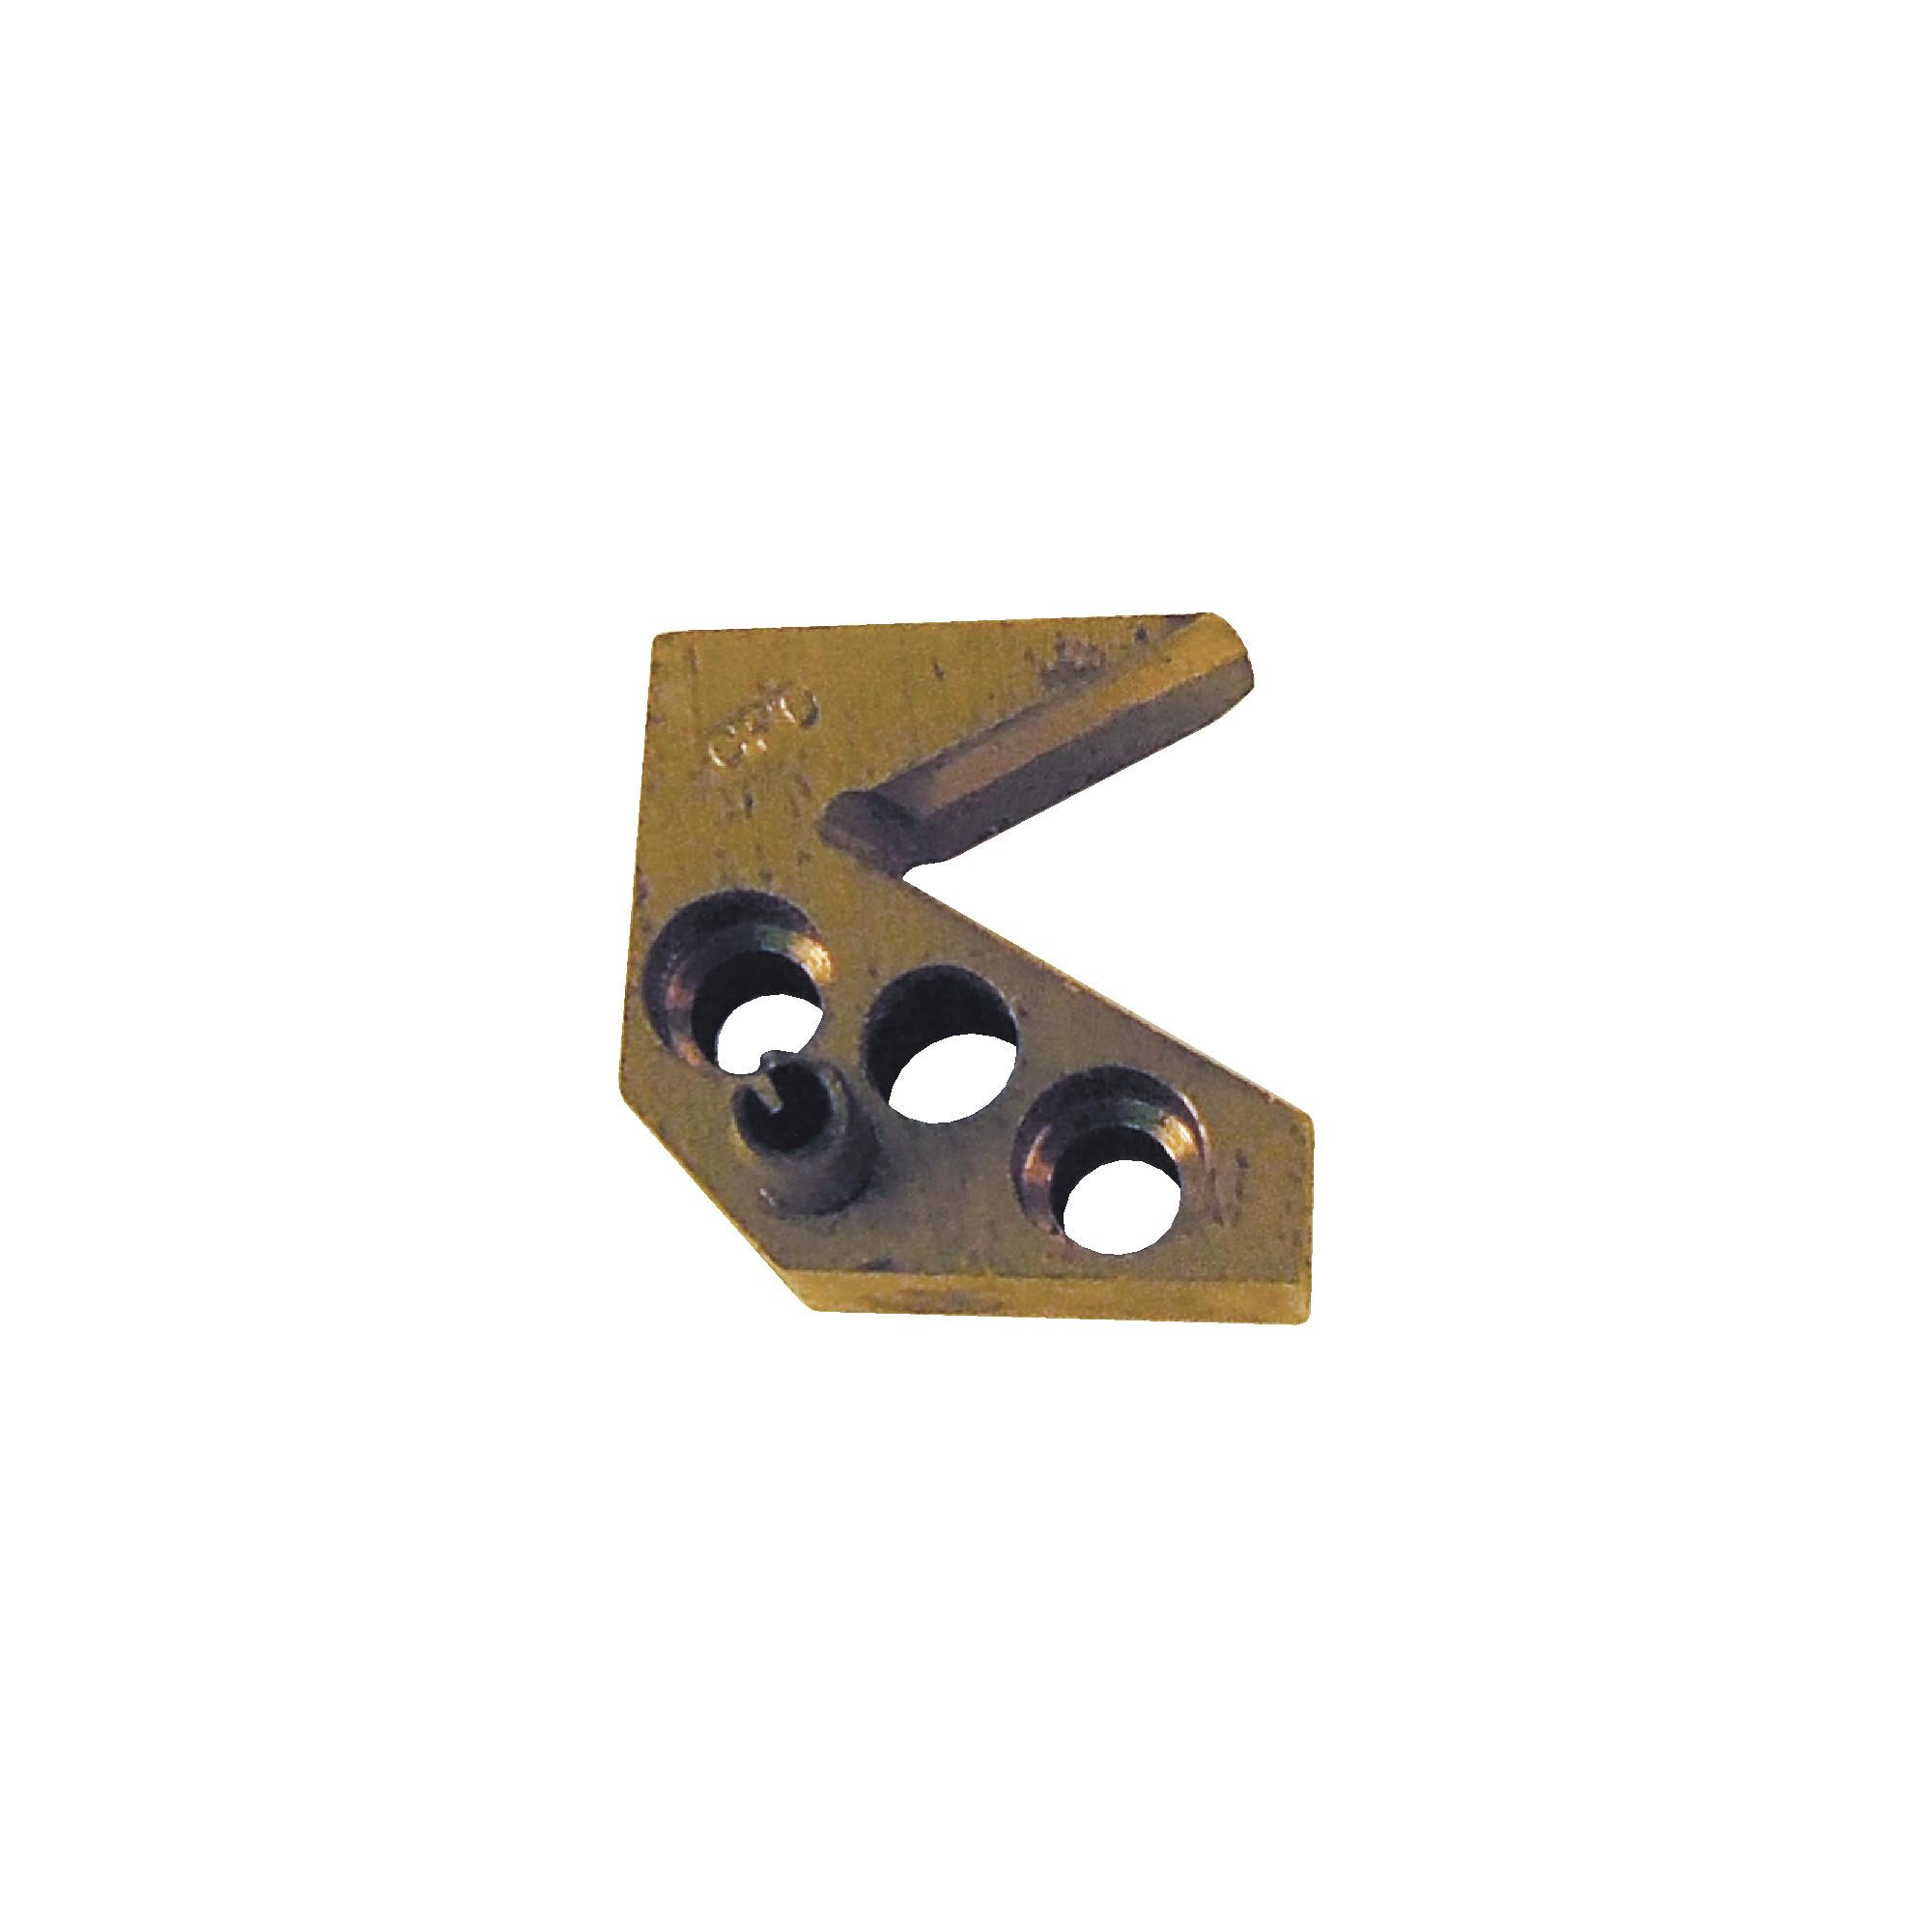 APT - CP-0 / Replacable Cartredge for Tri-Lead Boring Bar